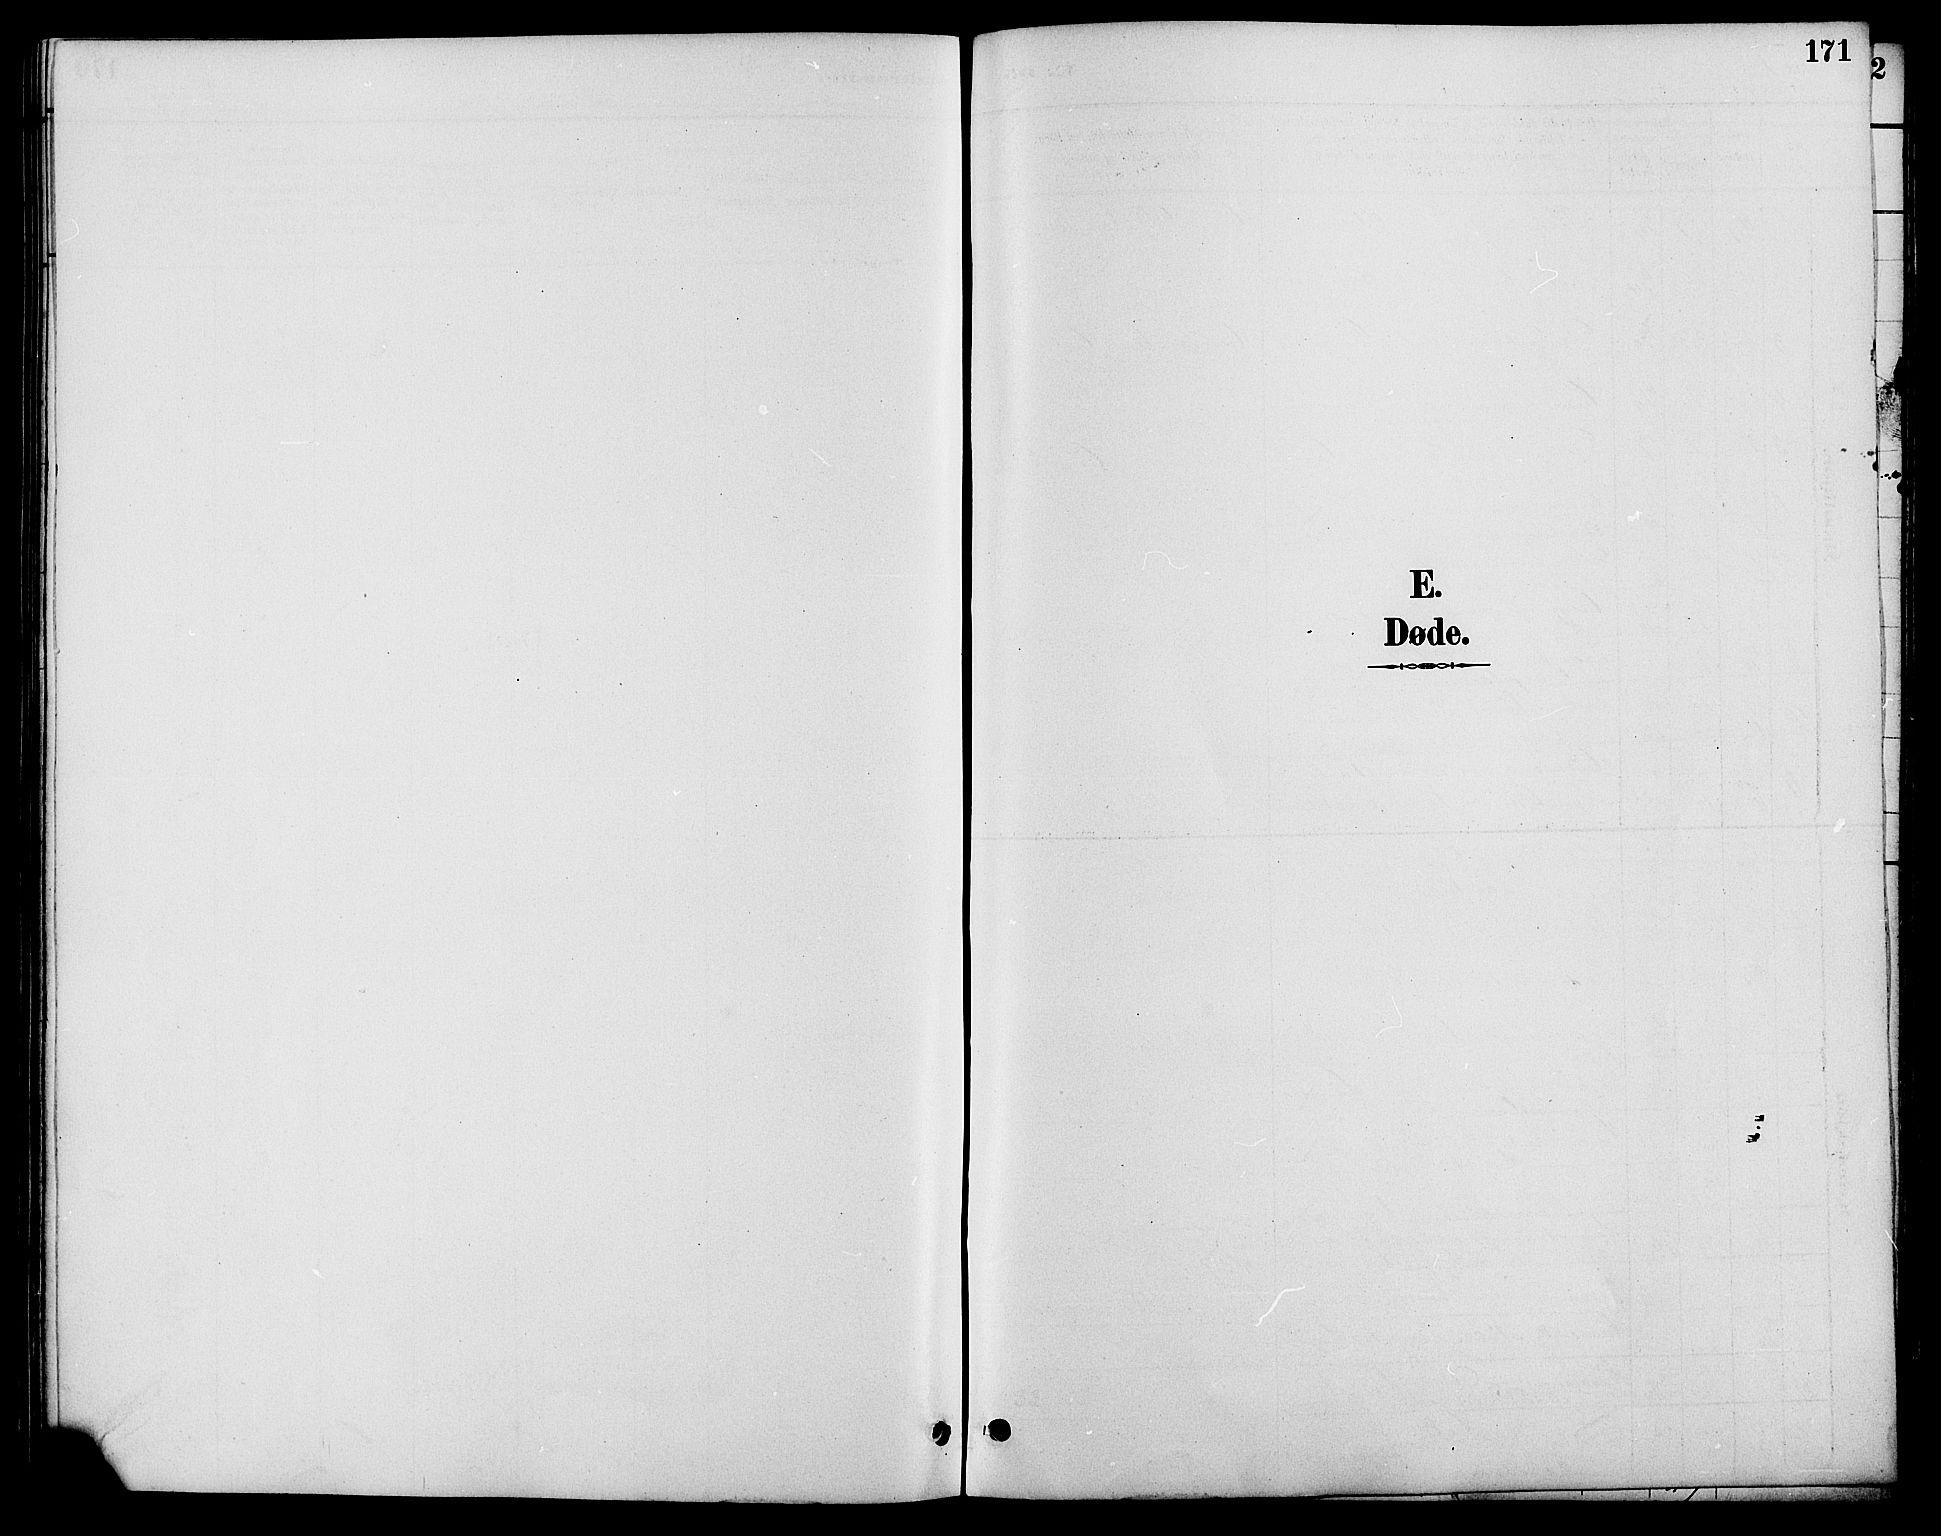 SAH, Nord-Fron prestekontor, Klokkerbok nr. 6, 1887-1914, s. 171